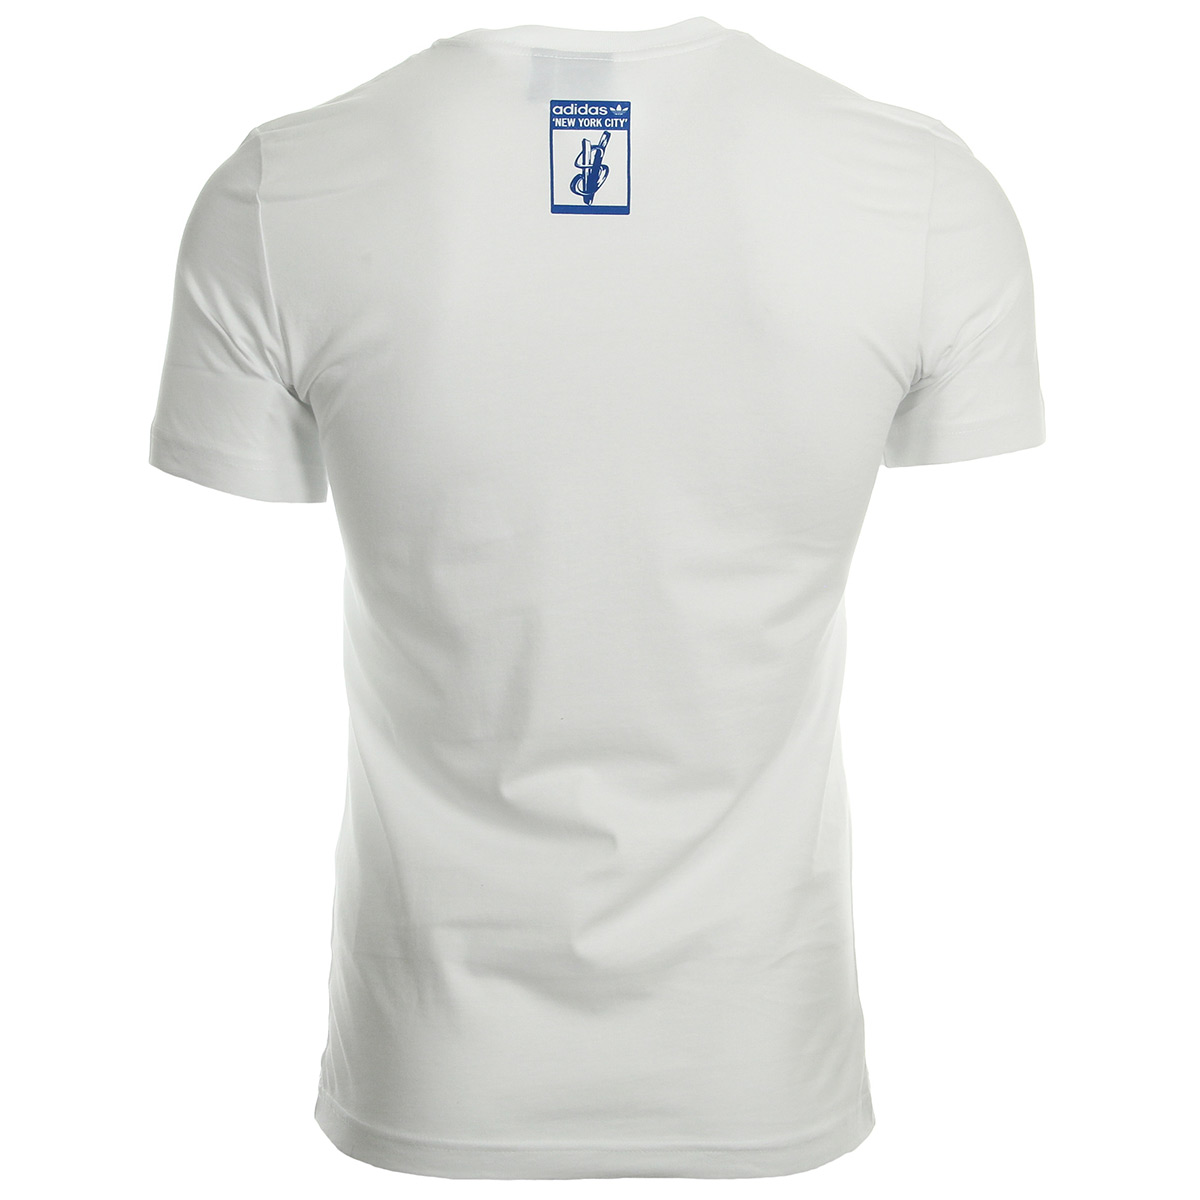 adidas Artist New York BQ3063, T-Shirts homme